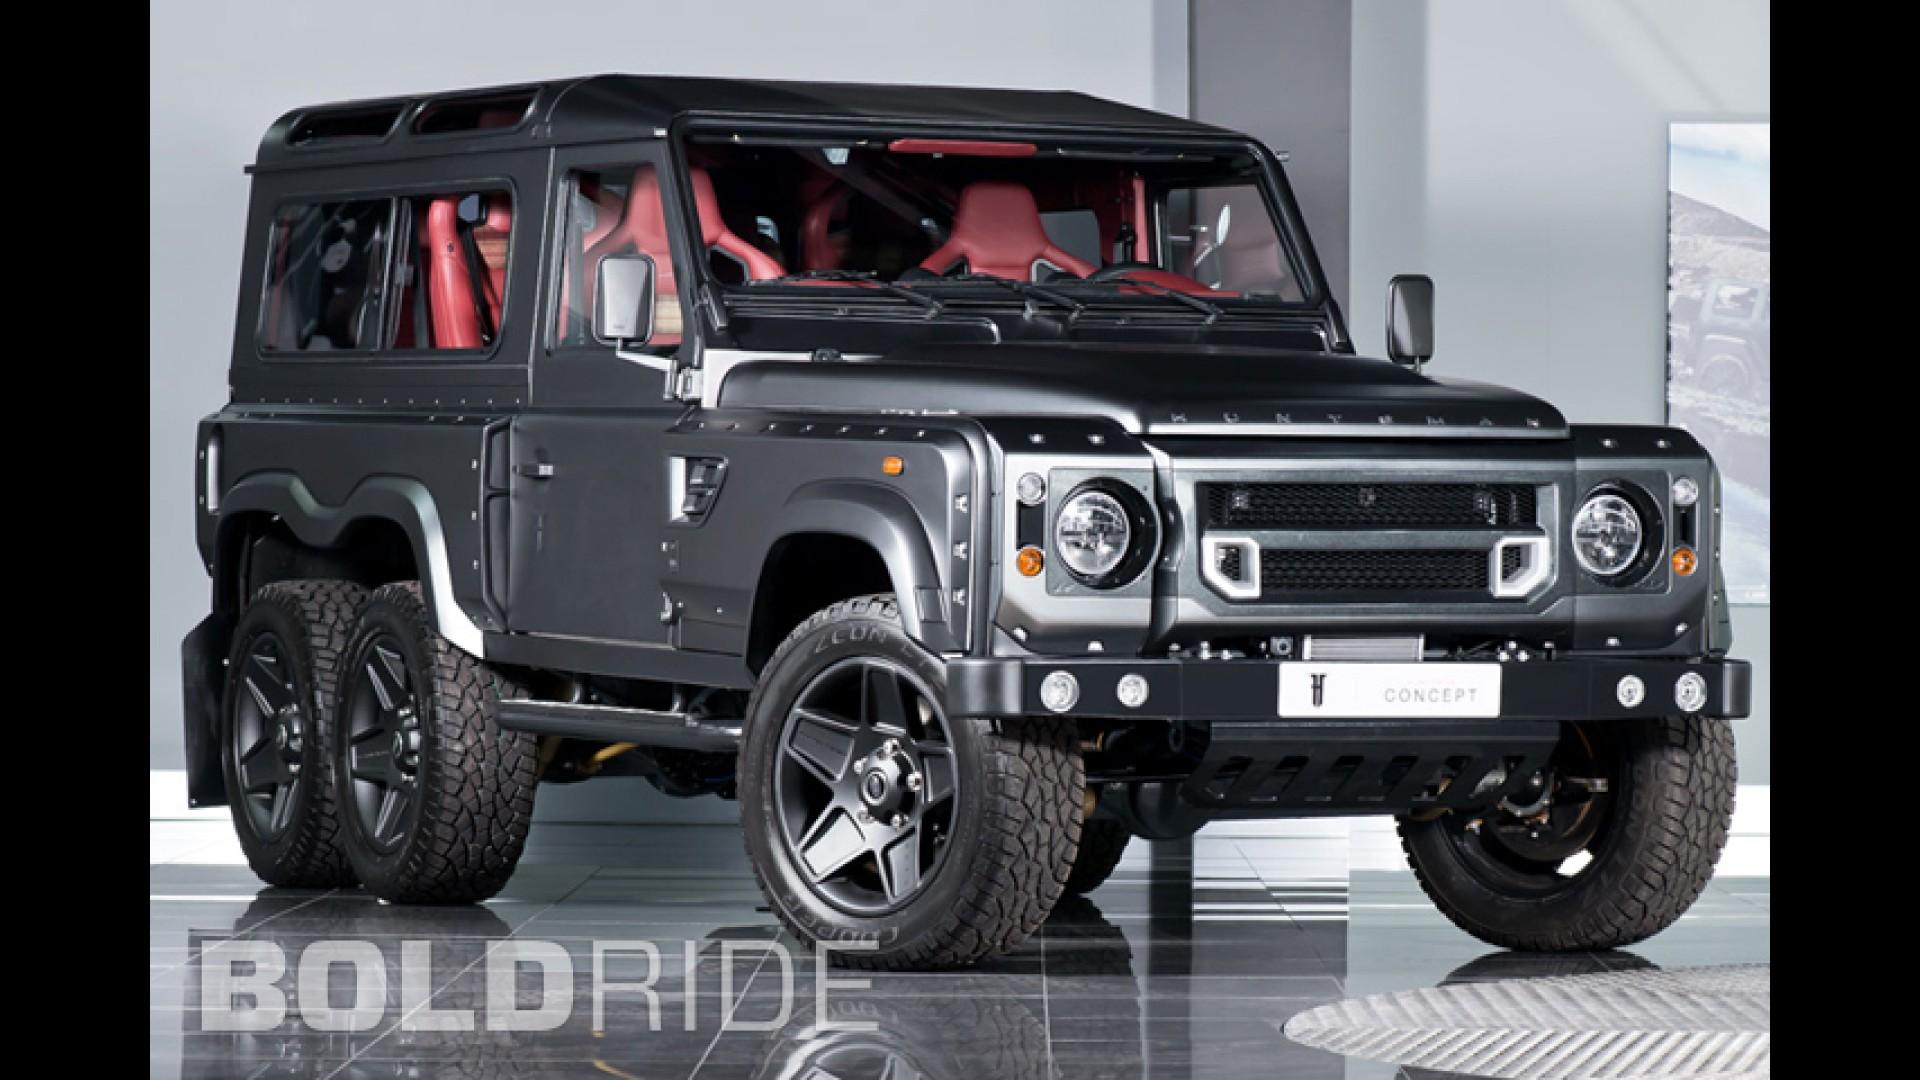 Land Rover Defender 110 Wallpaper